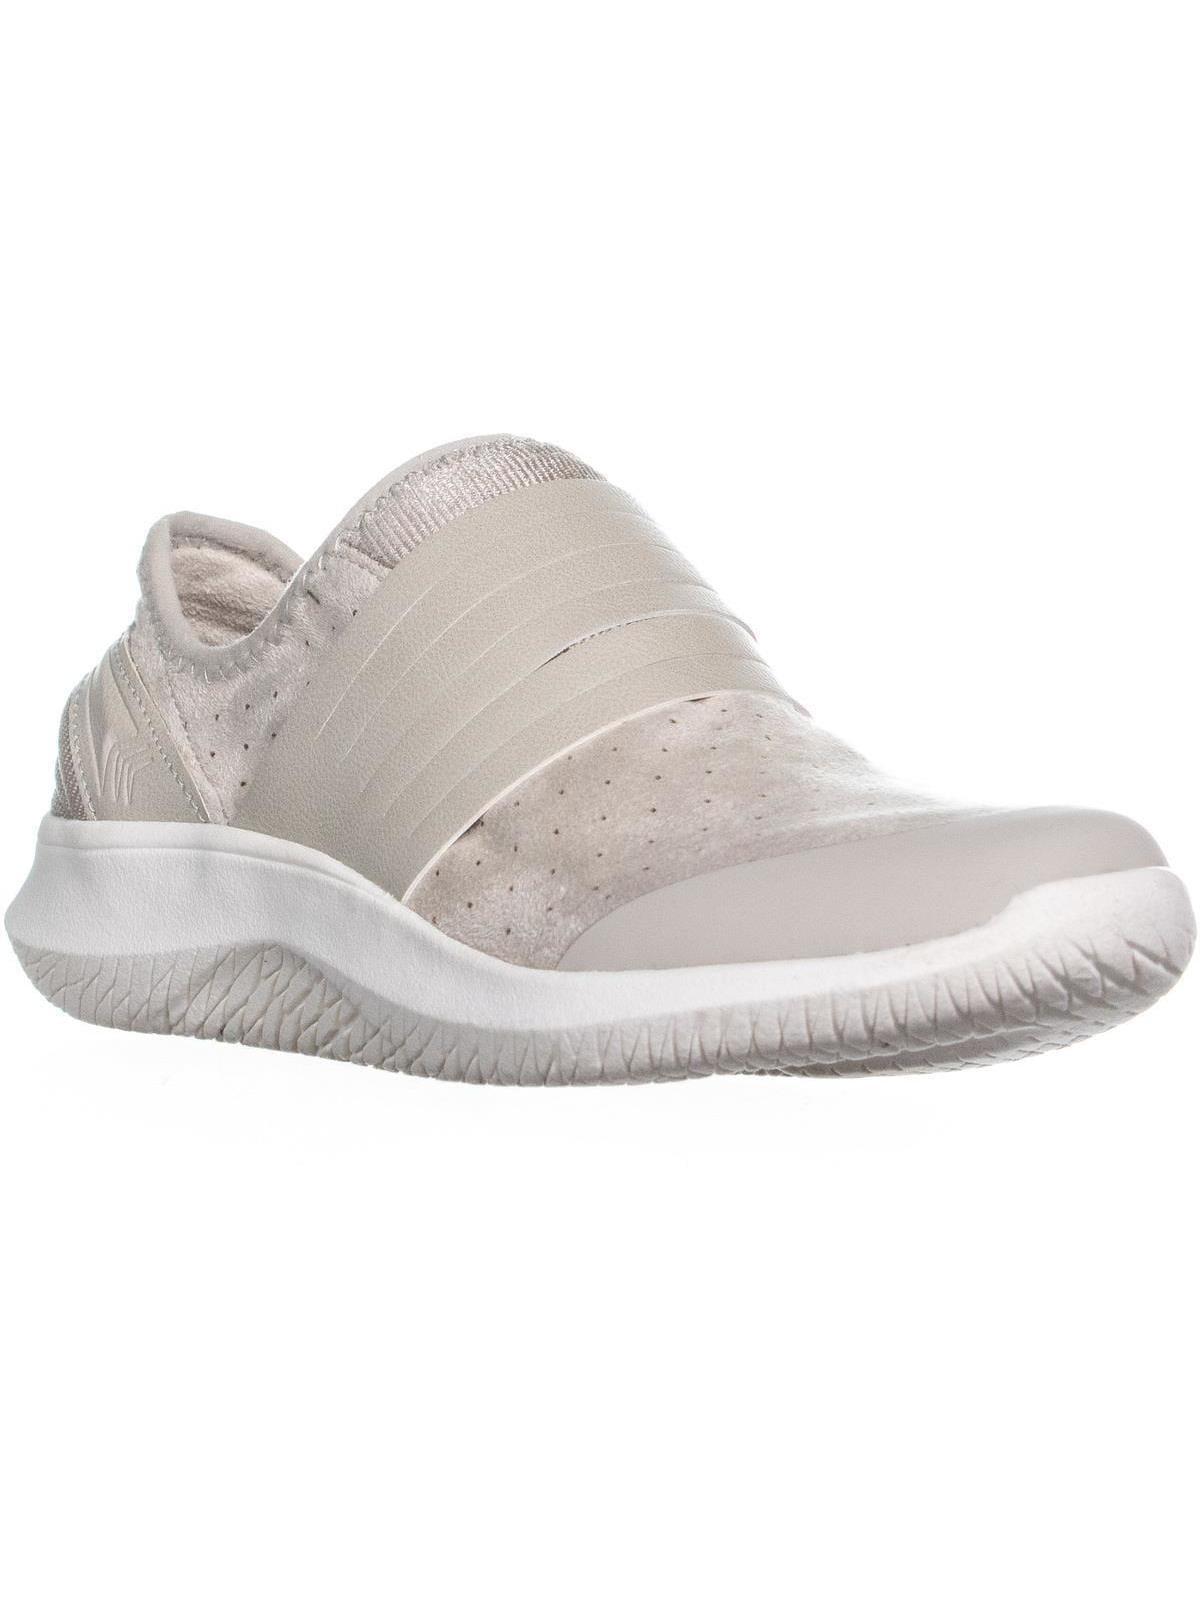 Dr. Scholl's Shoes - Womens Dr. Scholl